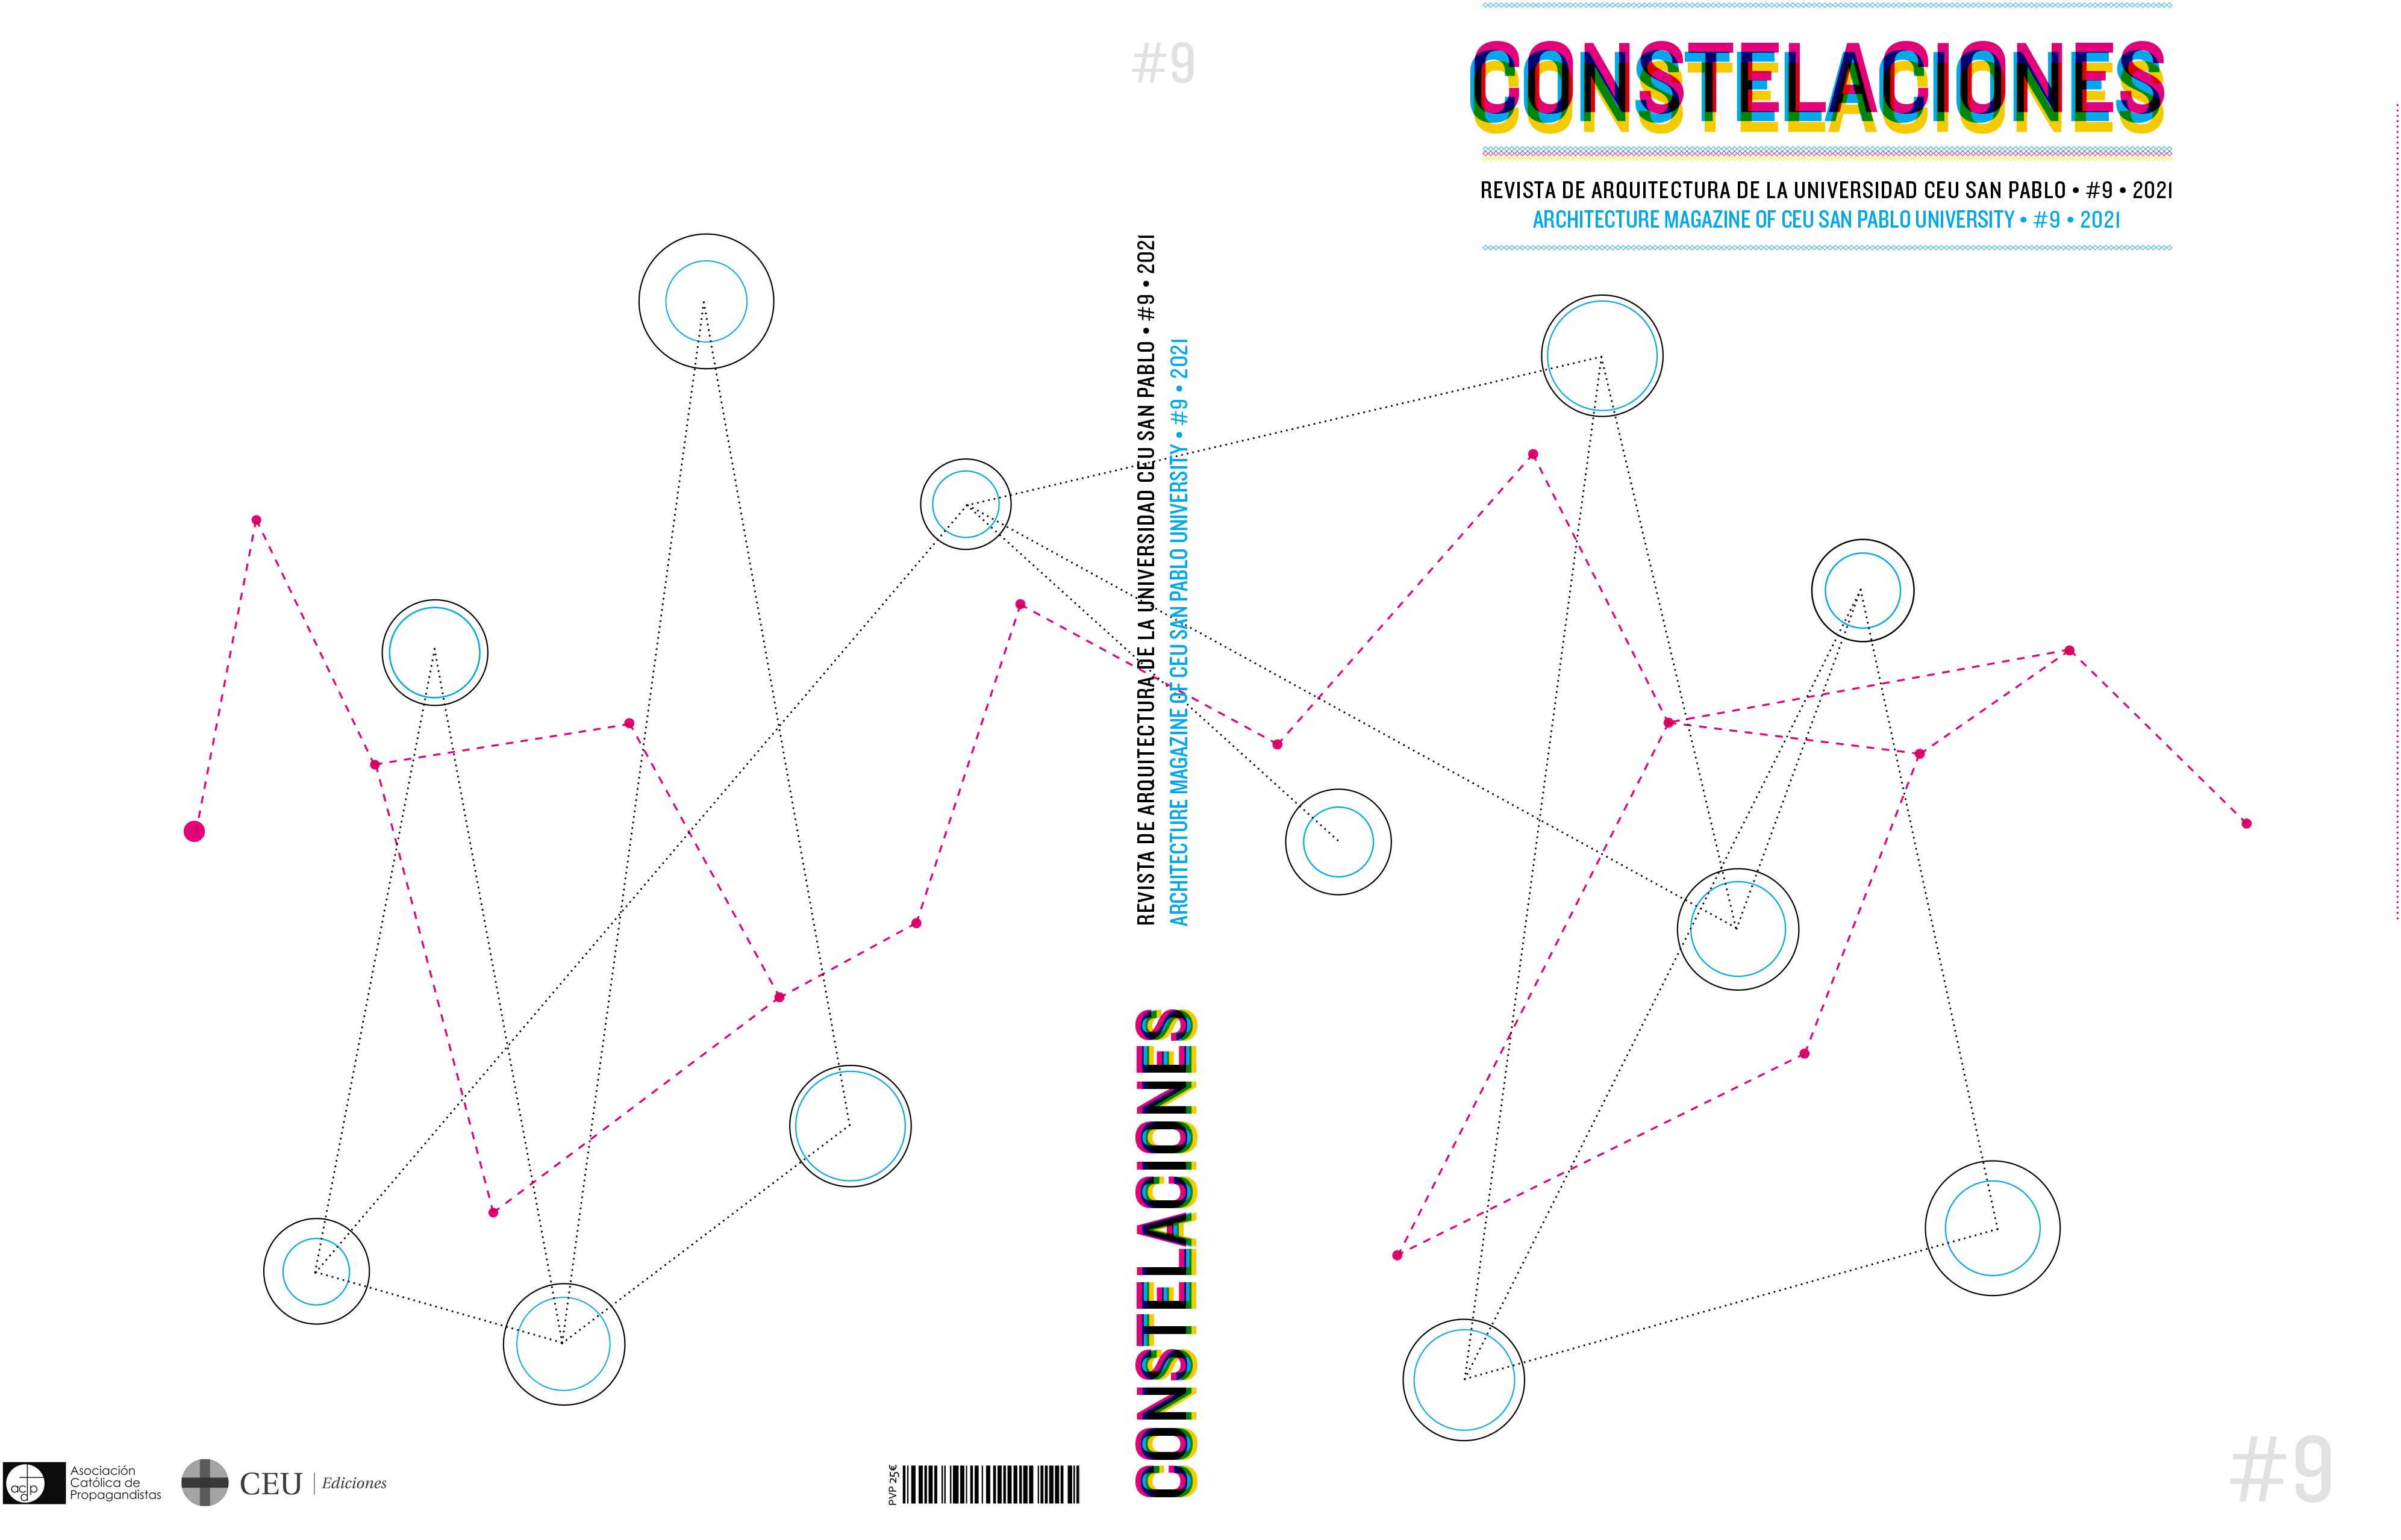 Ver Núm. 9 (2021): Constelaciones nº 9